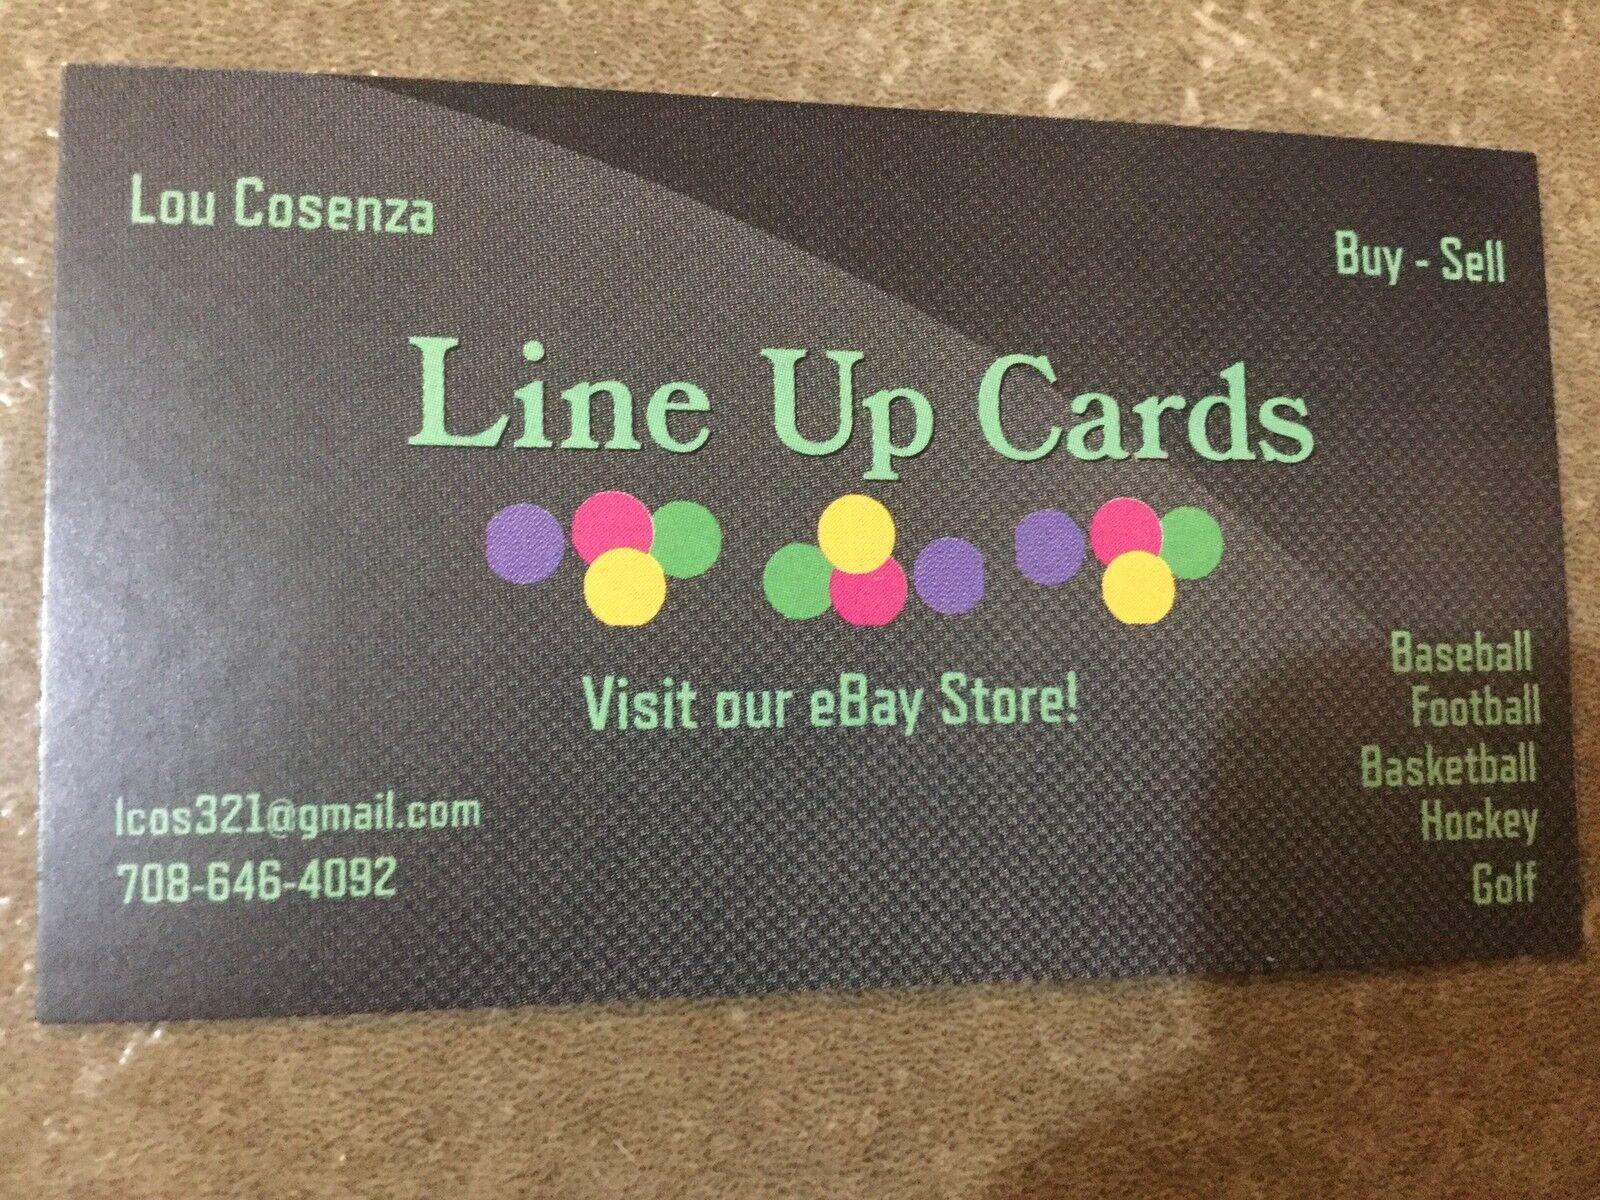 Lineup Cards